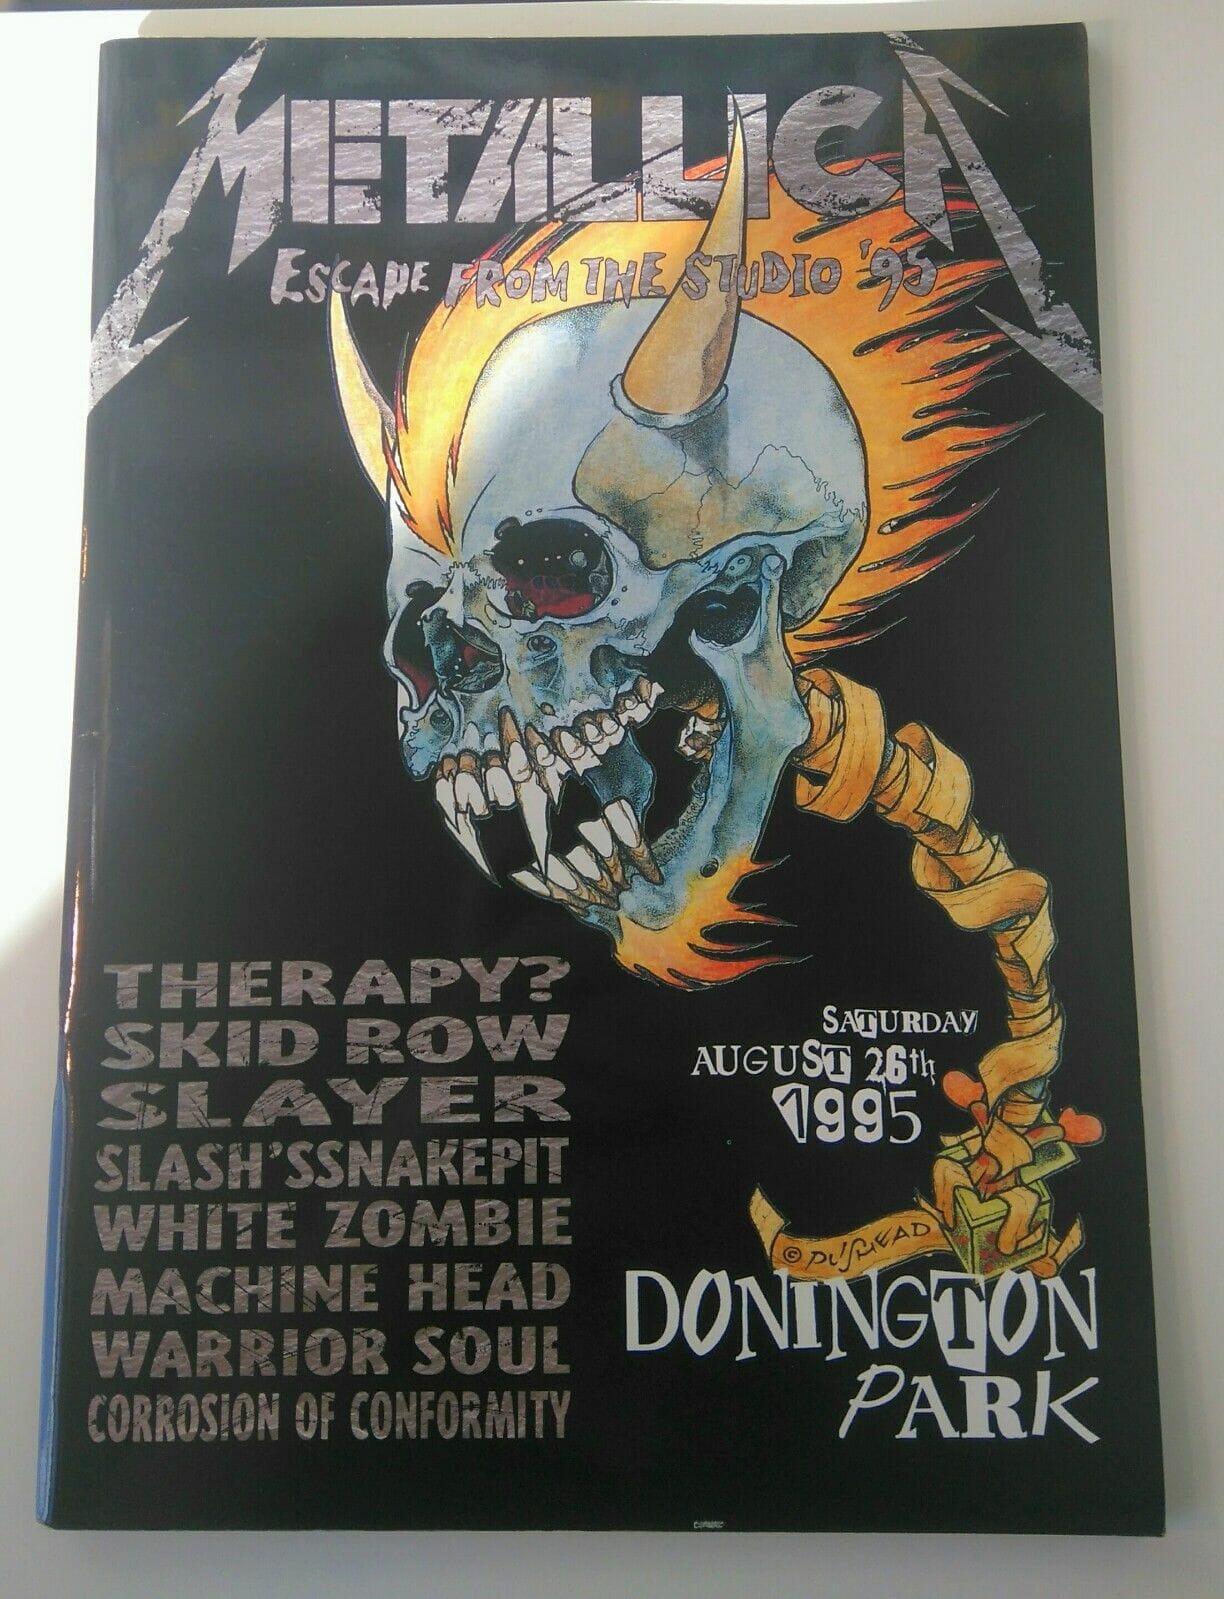 Monsters Of Rock Festival Programme Donington 1995 Signed